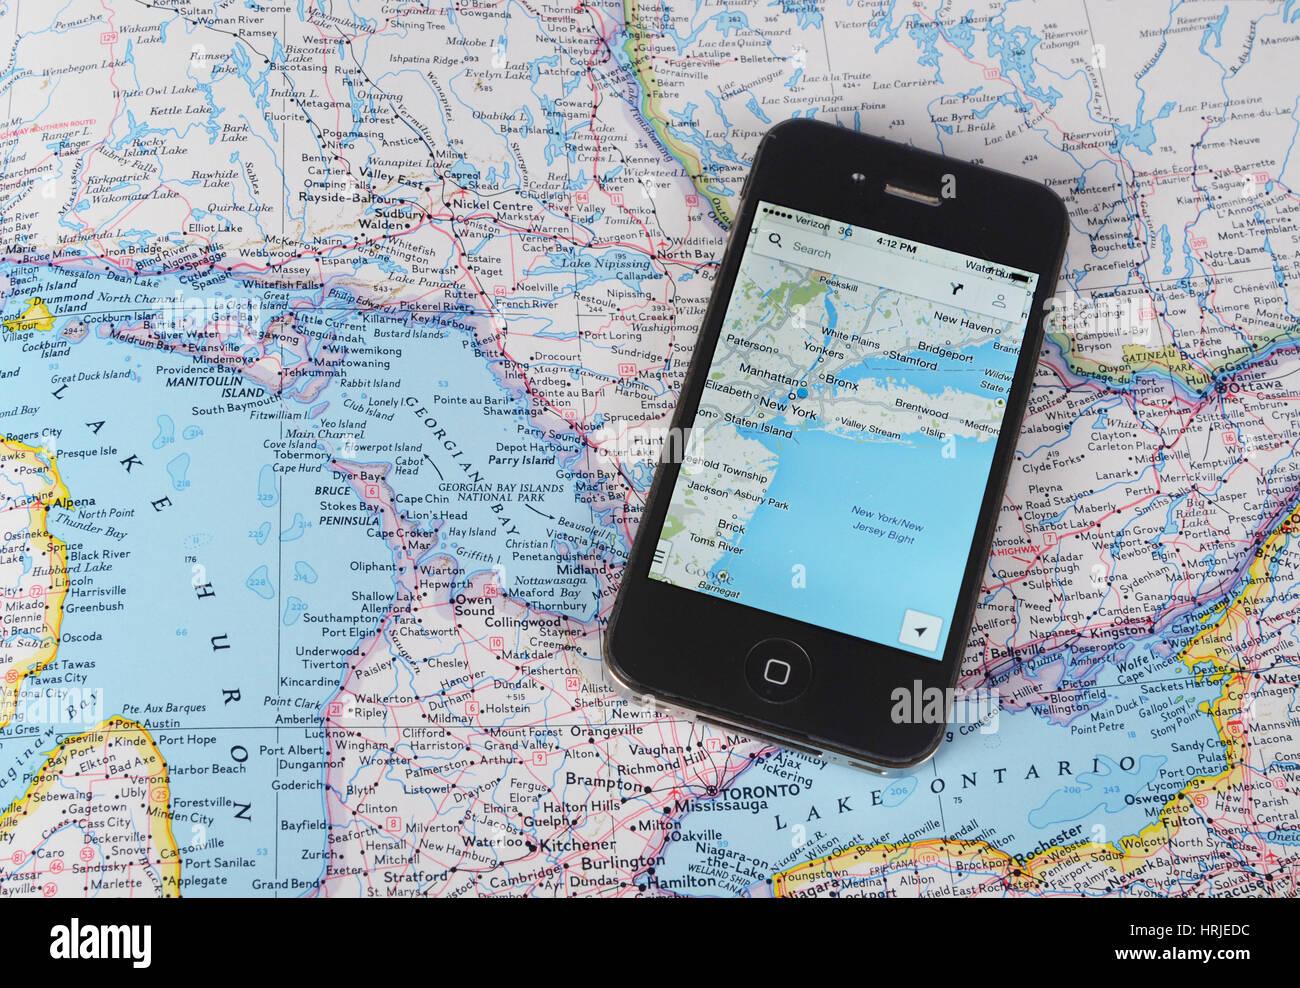 Maps - Stock Image